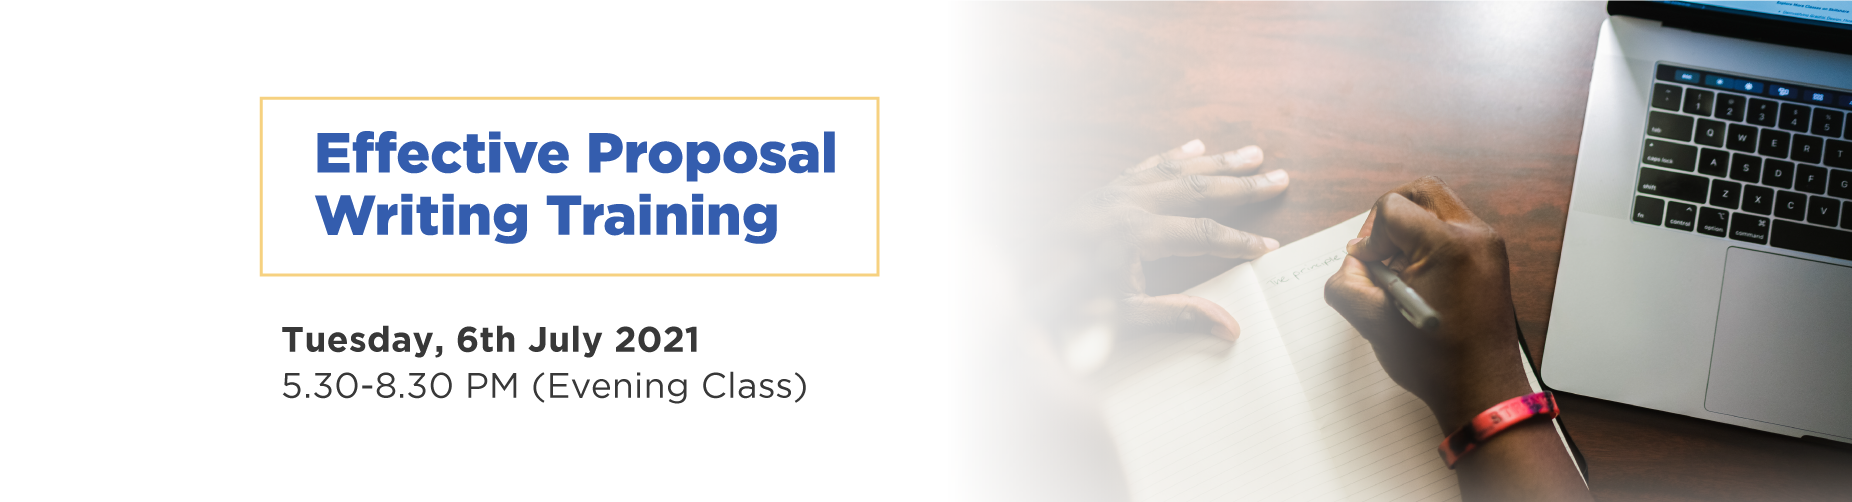 web-banner-Effective-proposal-writing-training